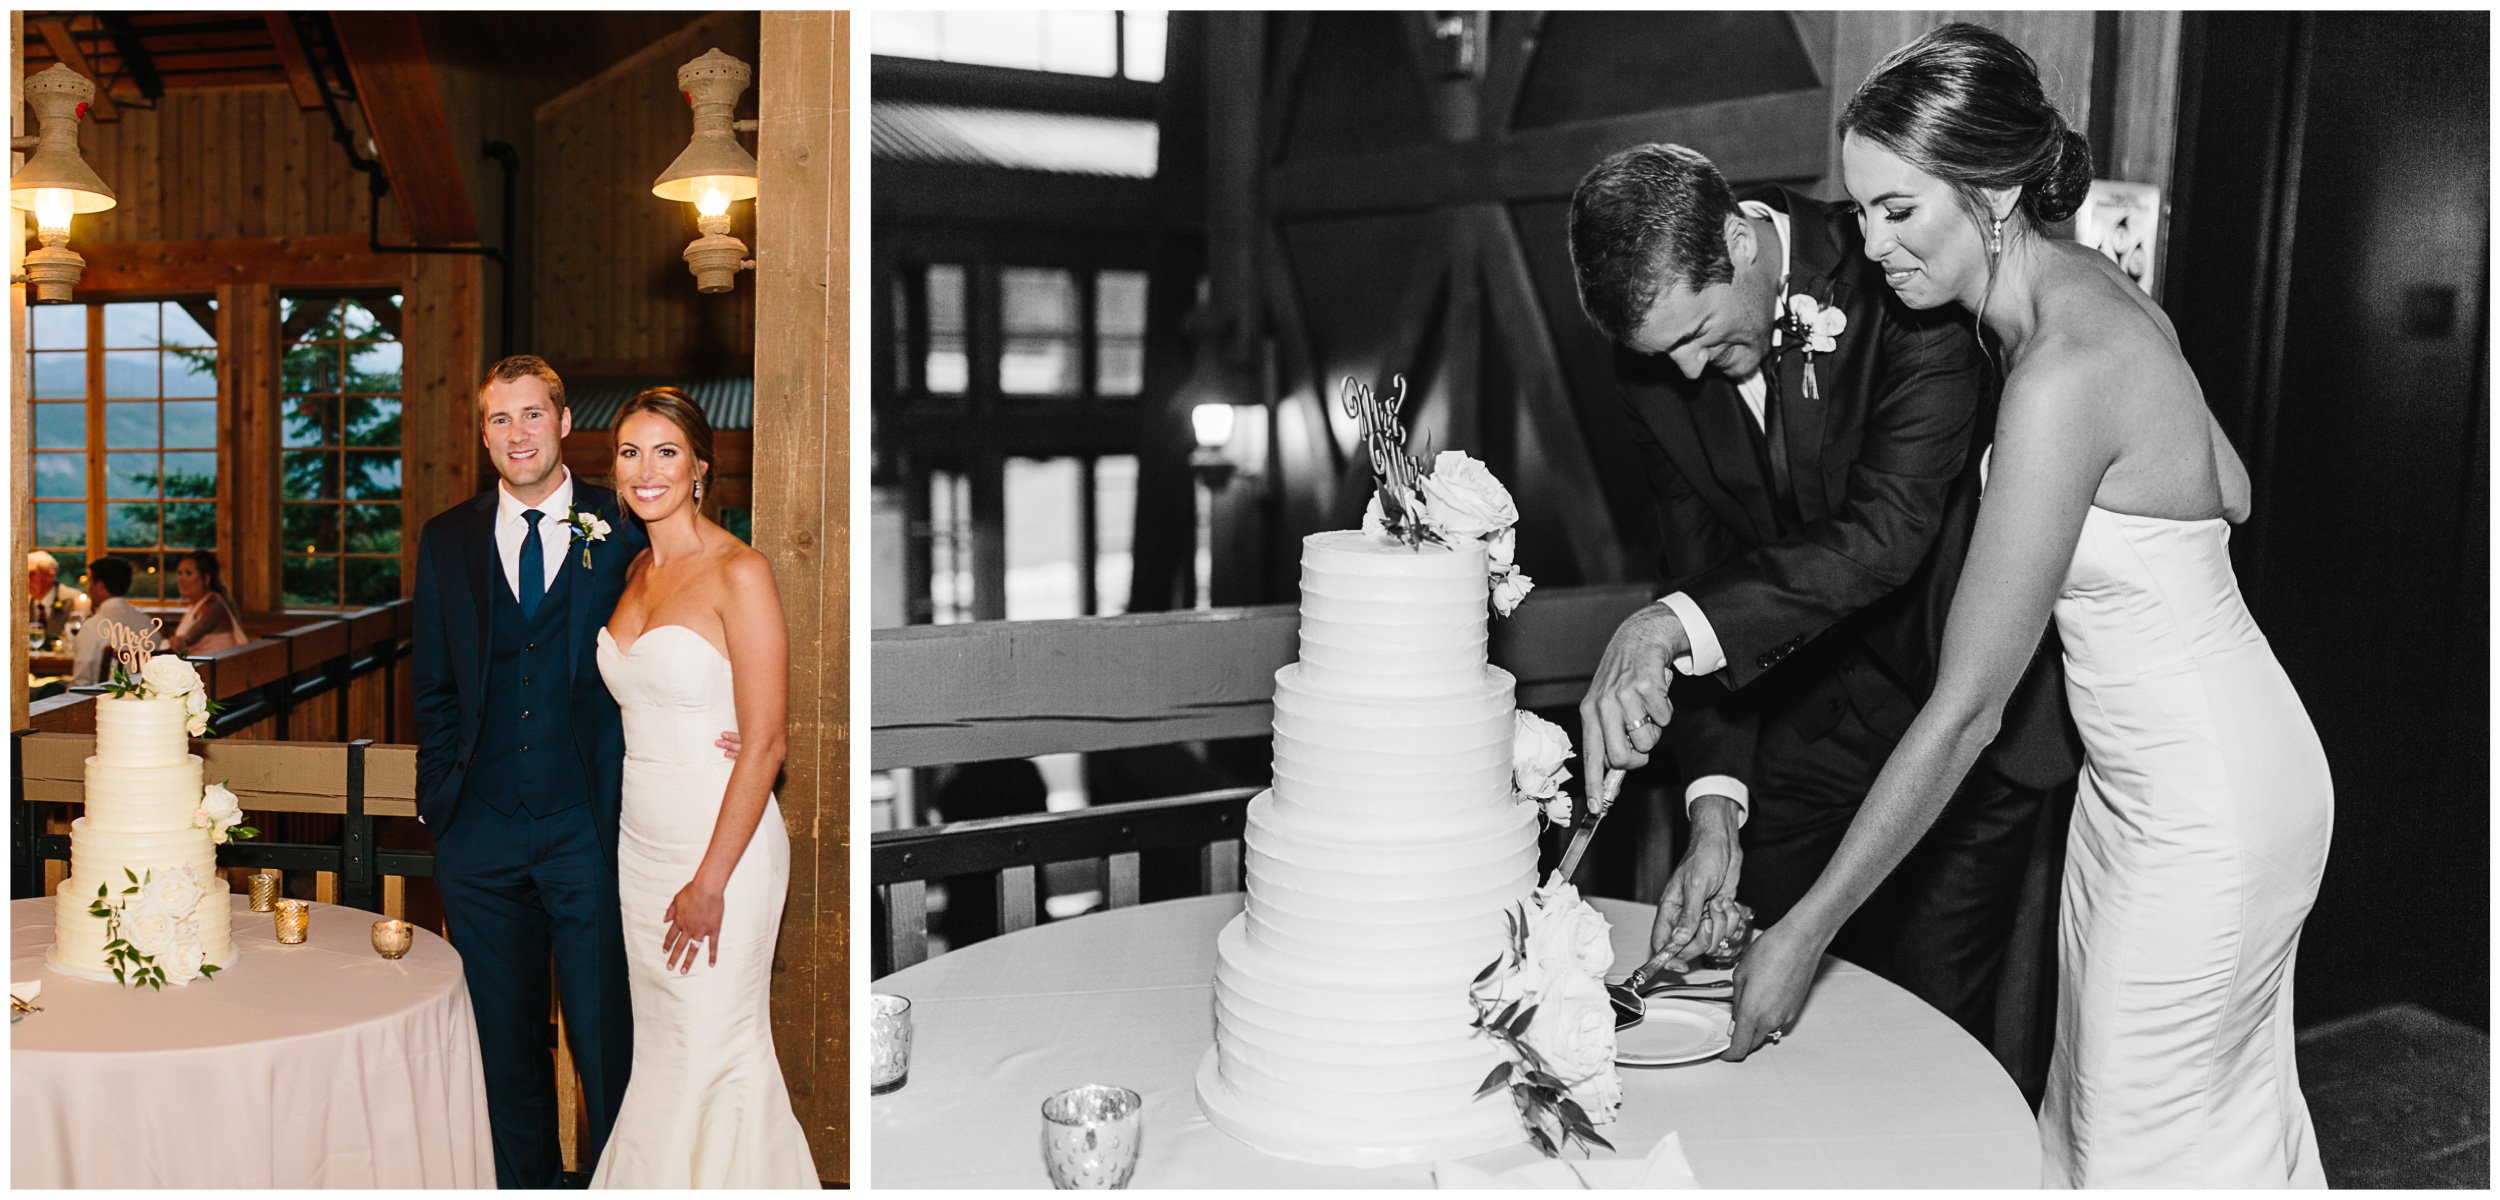 breckenridge_wedding_77.jpg